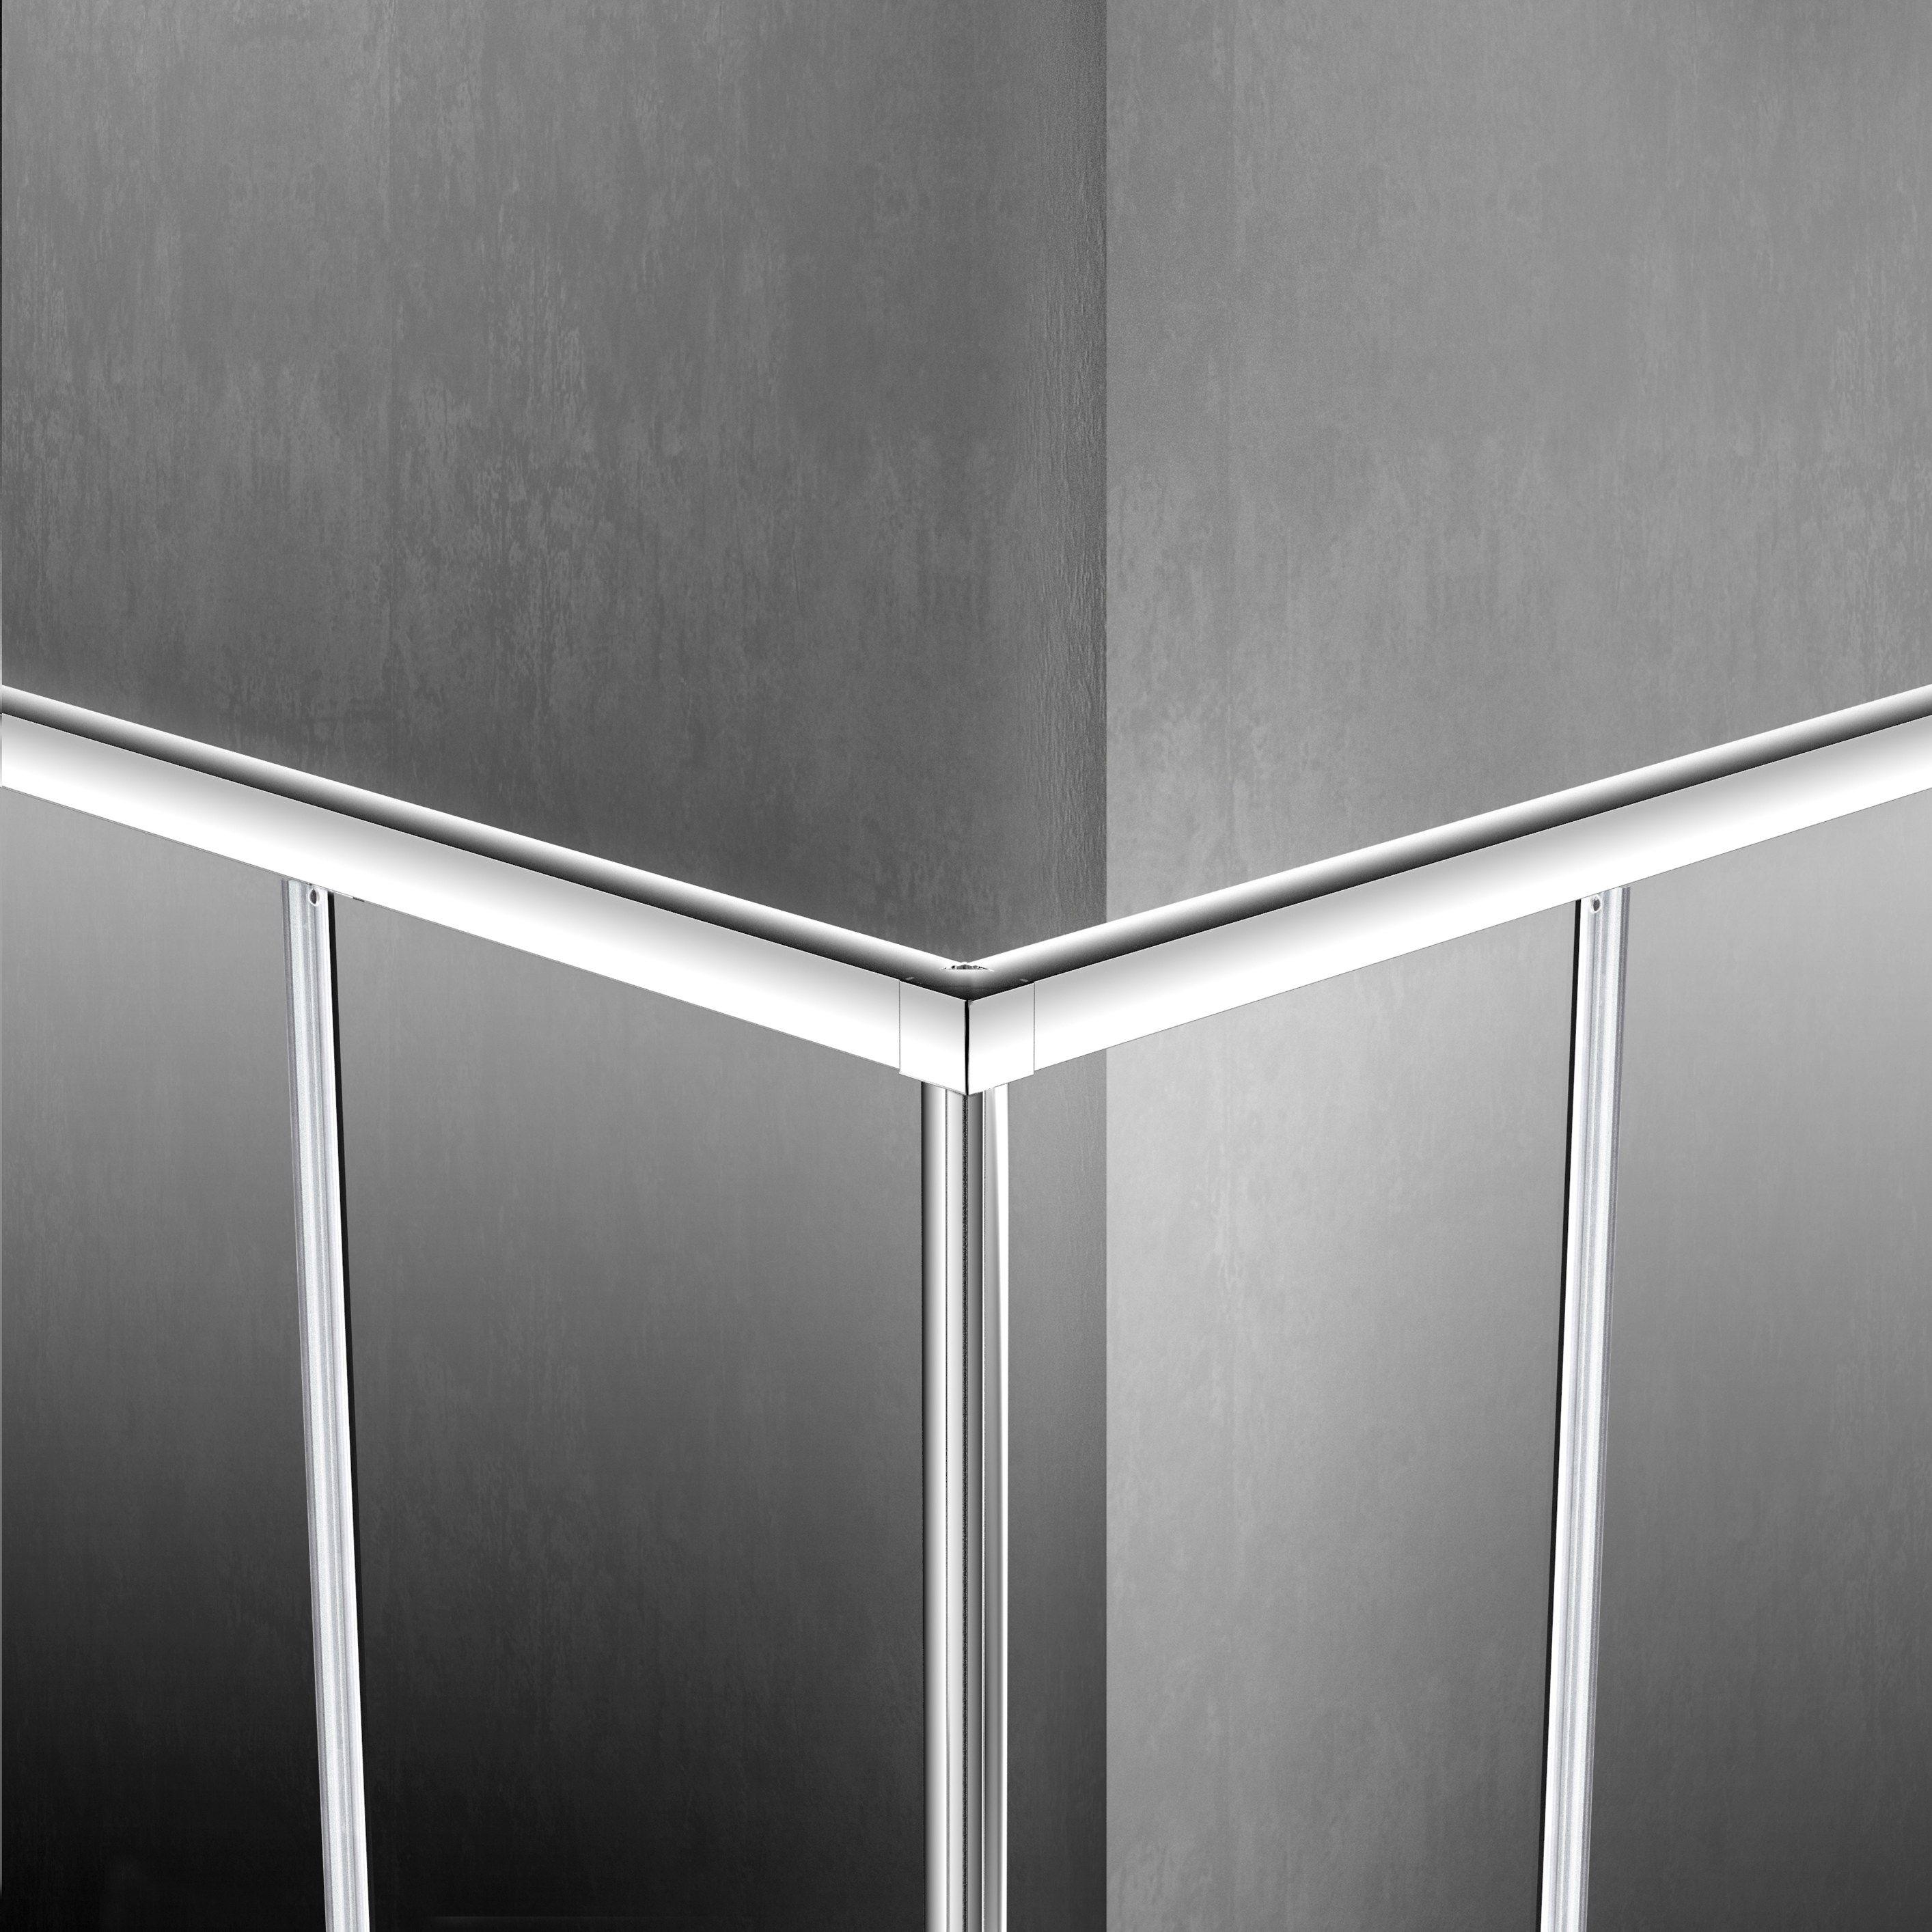 Stila 2000 box doccia by duka - Box doccia in vetro prezzi ...